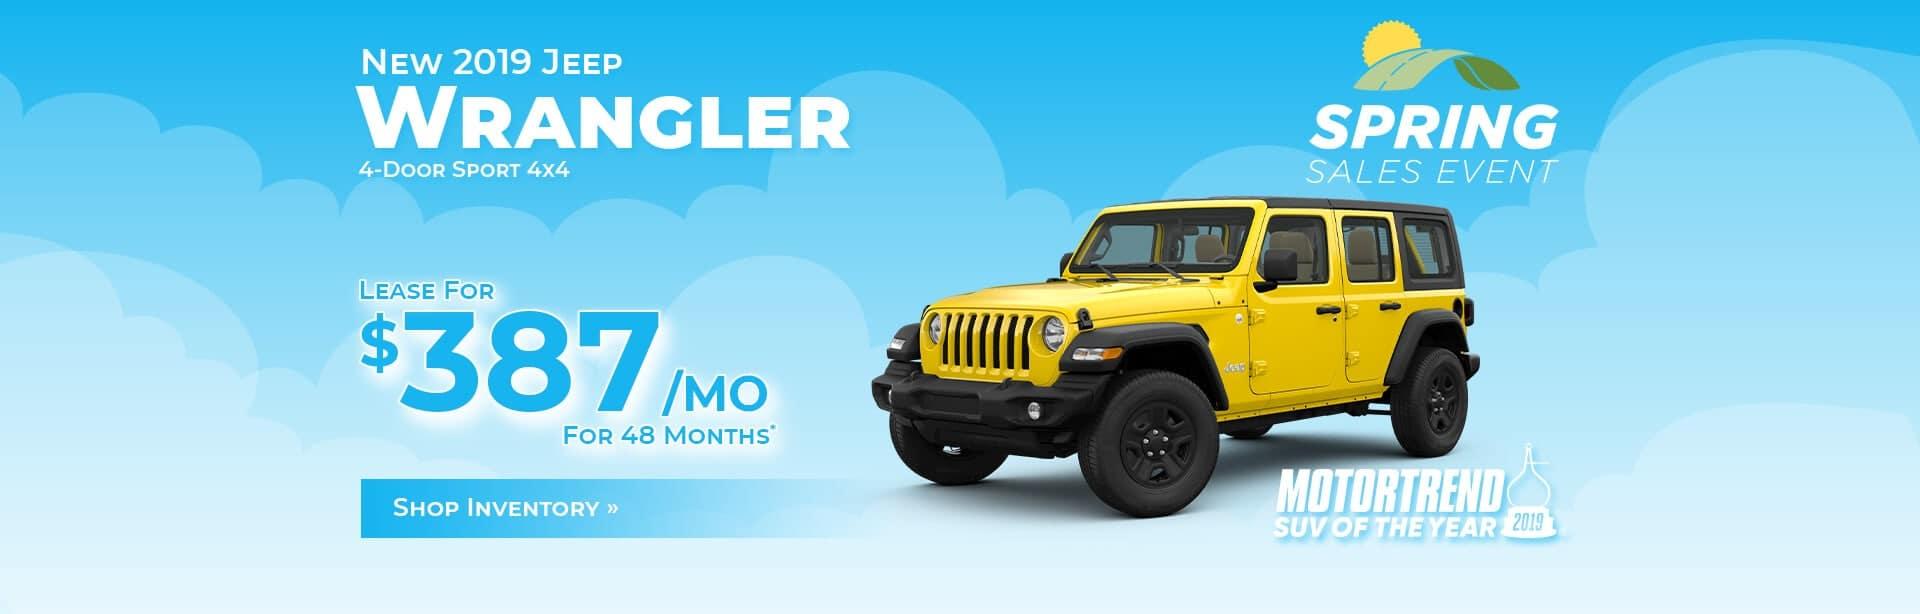 Jeep Wrangler Dealer near West Lafayette, Indiana.